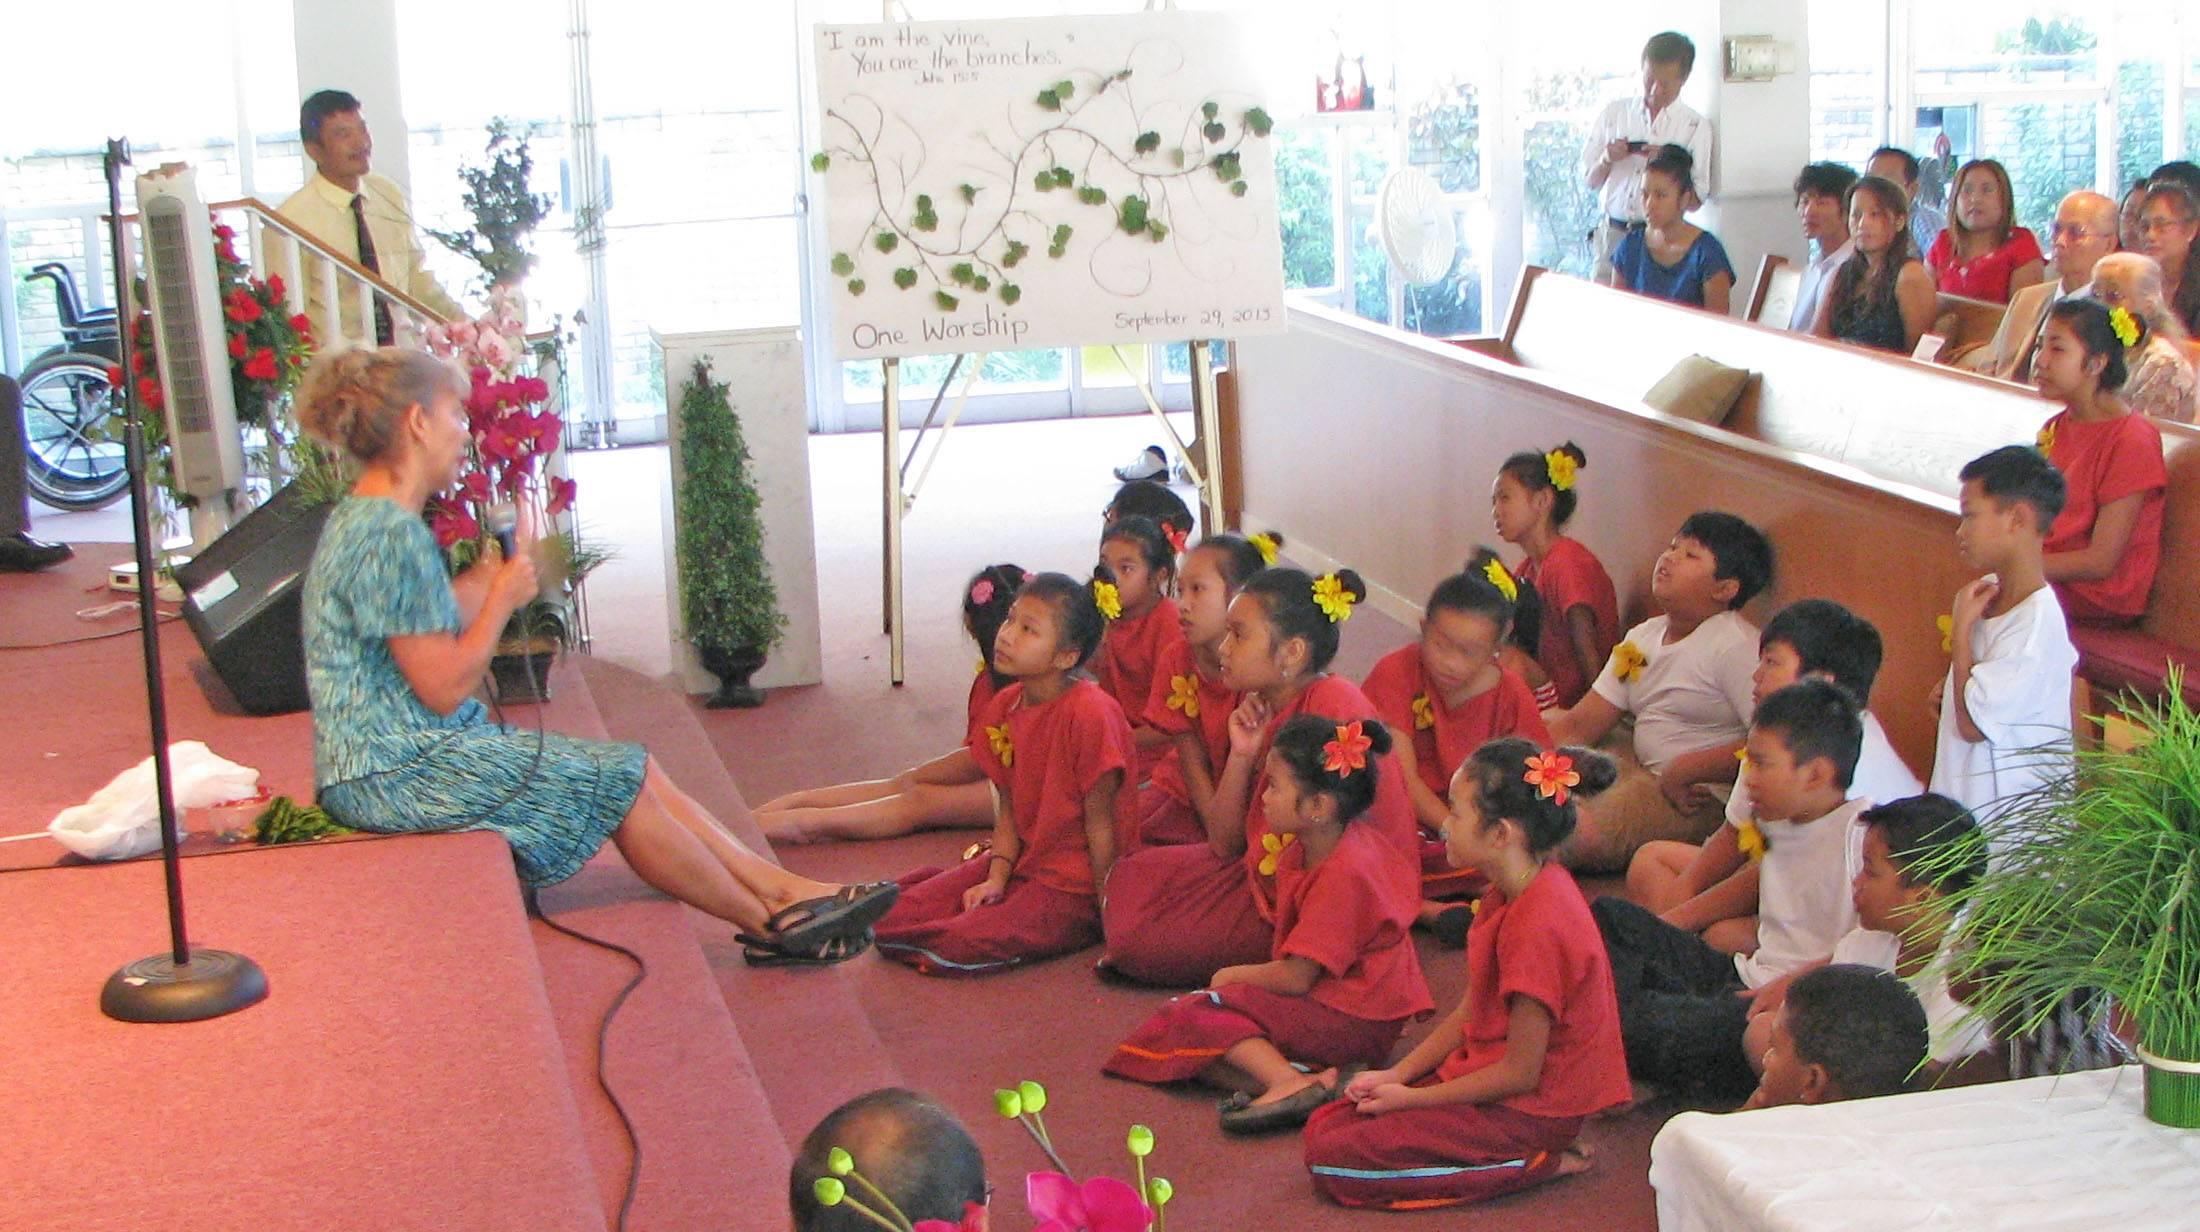 Jacquie leads the Children's Message